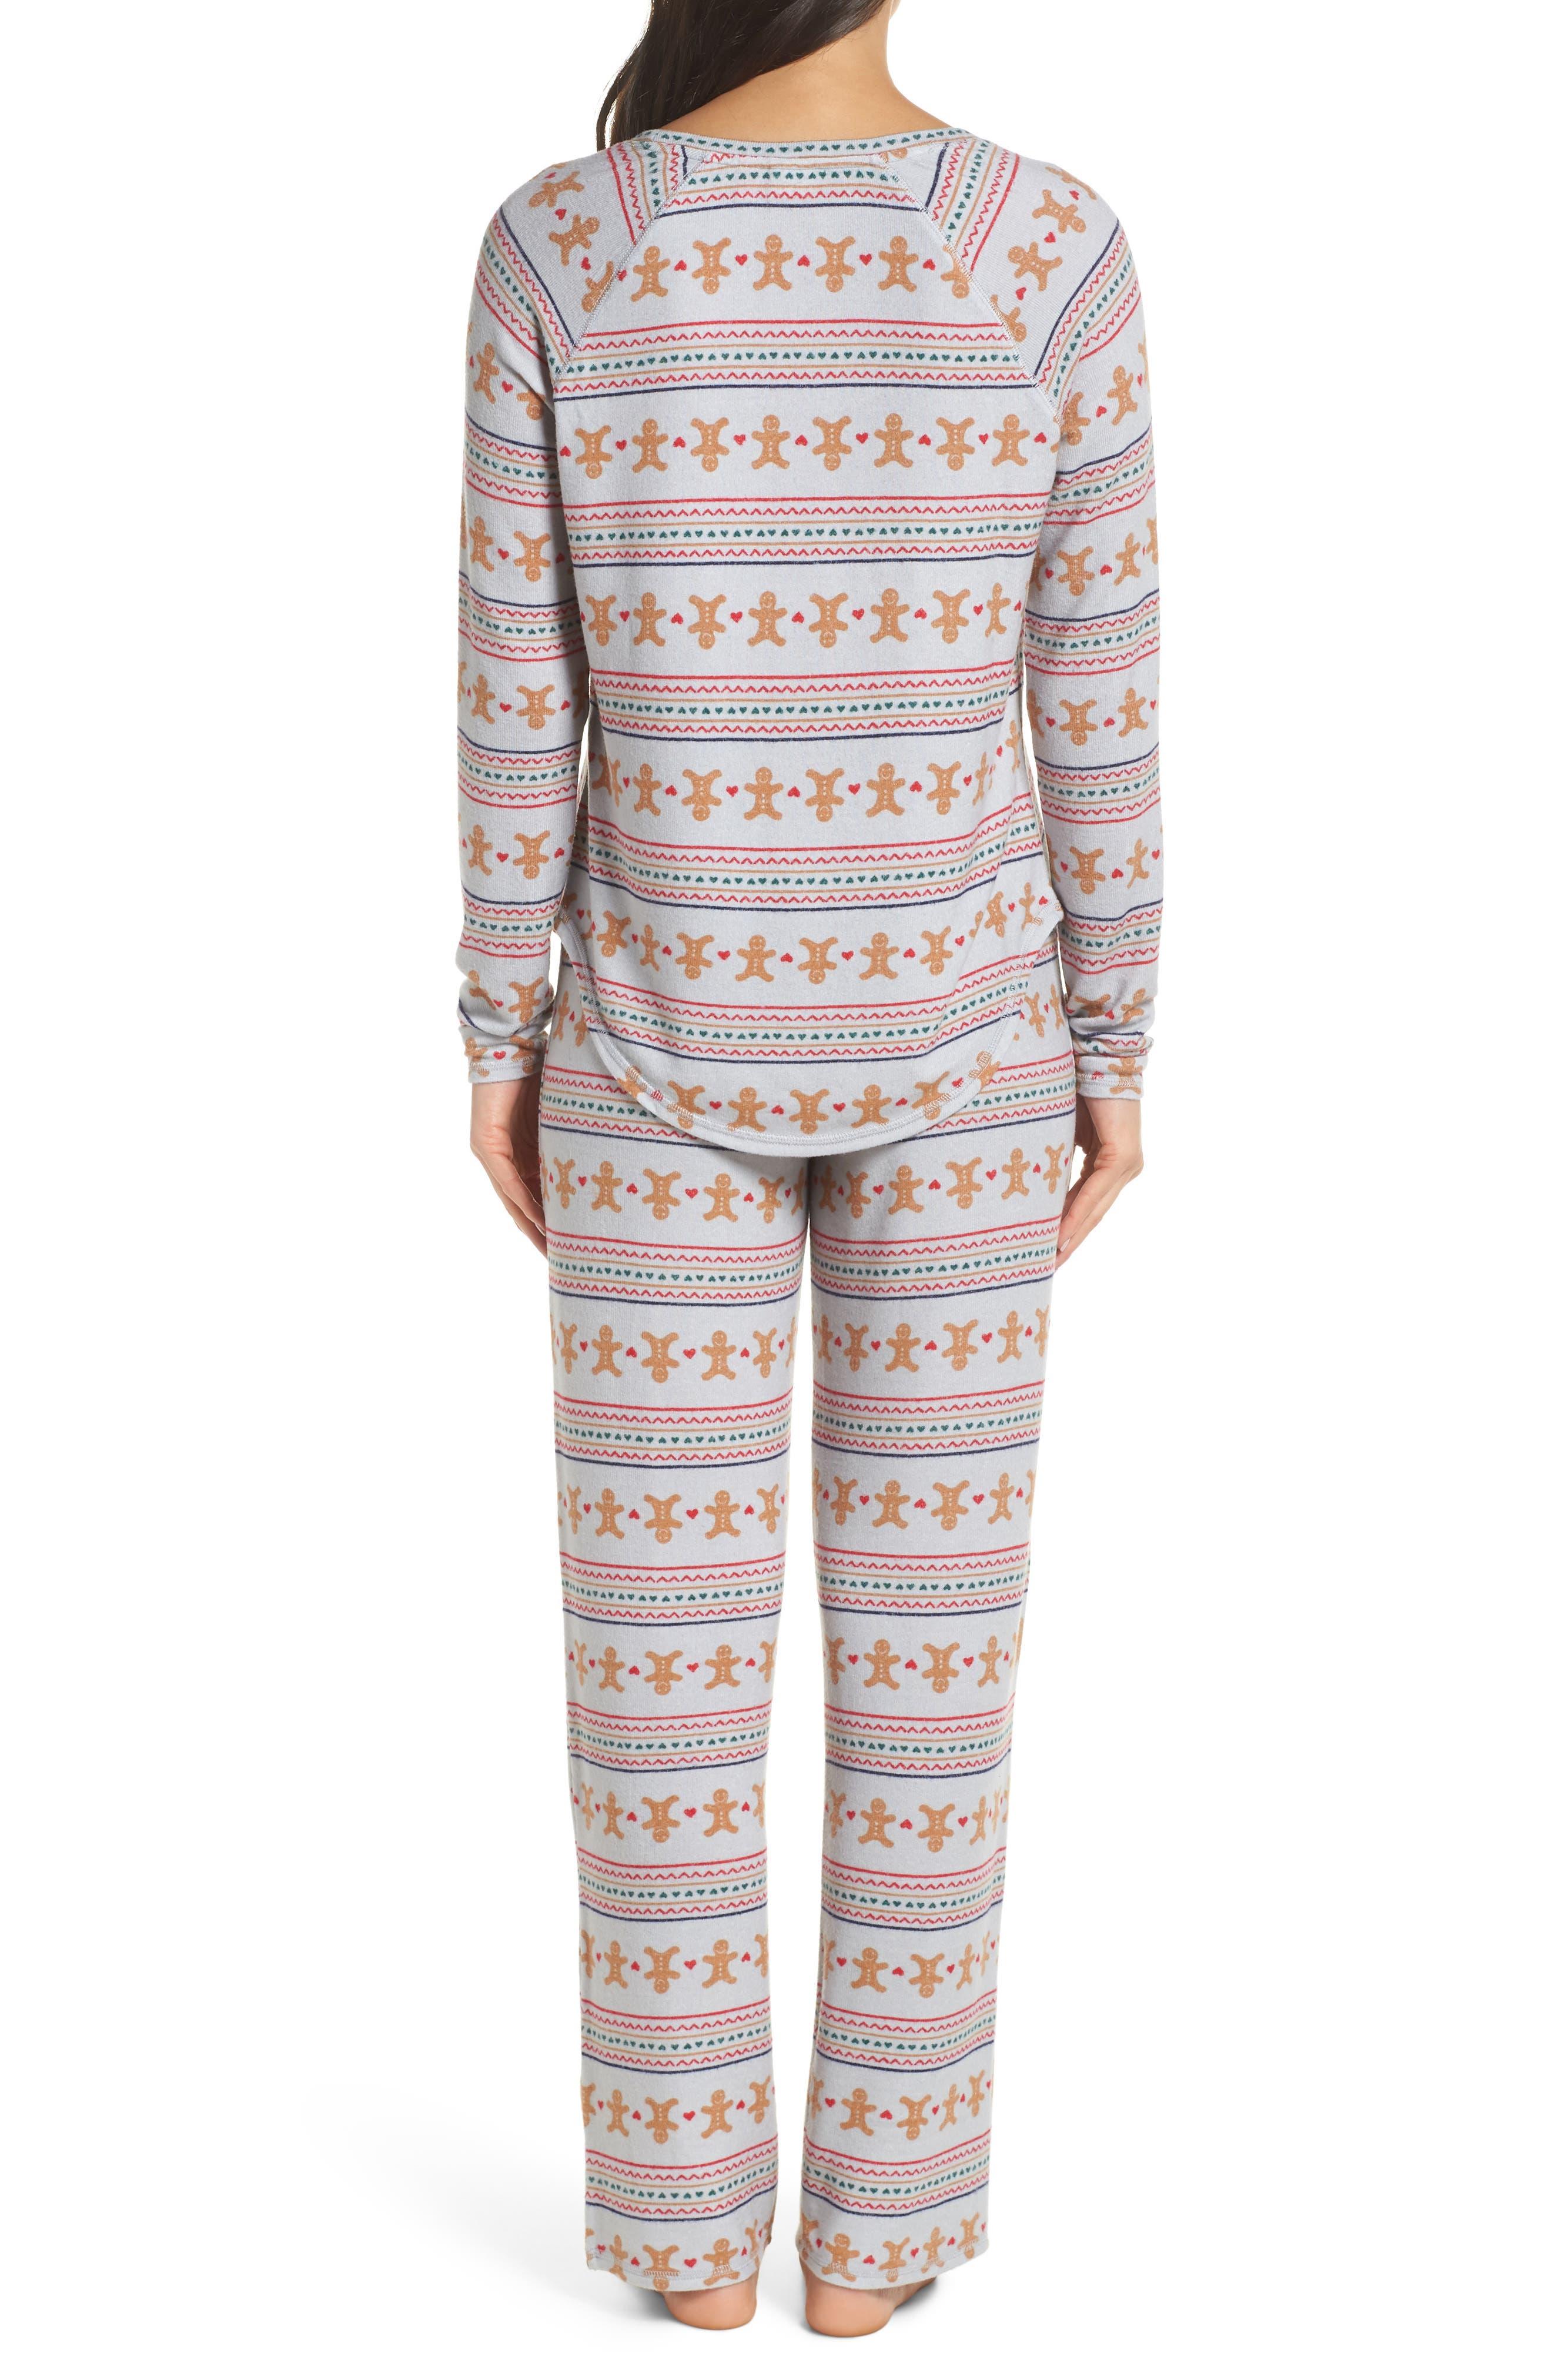 Knit Girlfriend Pajamas & Eye Mask,                             Alternate thumbnail 2, color,                             GREY MICRO GINGERBREAD